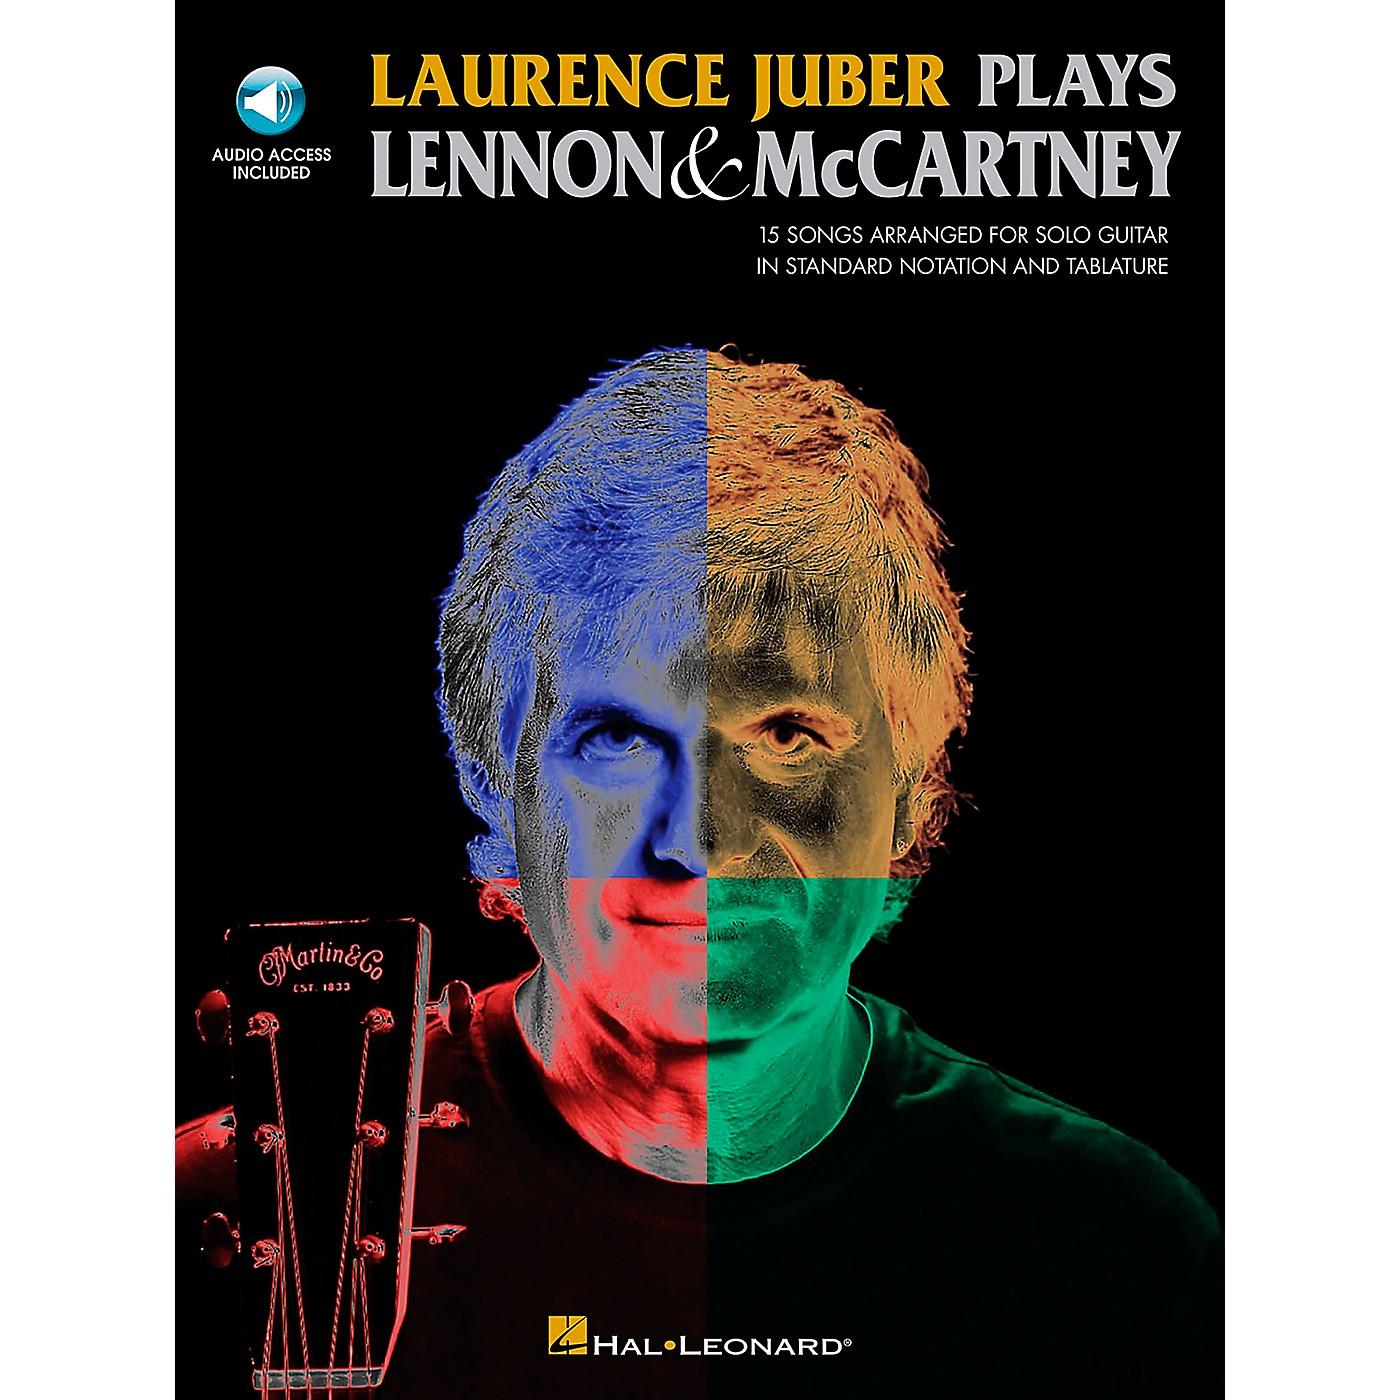 Hal Leonard Laurence Juber Plays Lennon & Mccartney (Book/CD) thumbnail